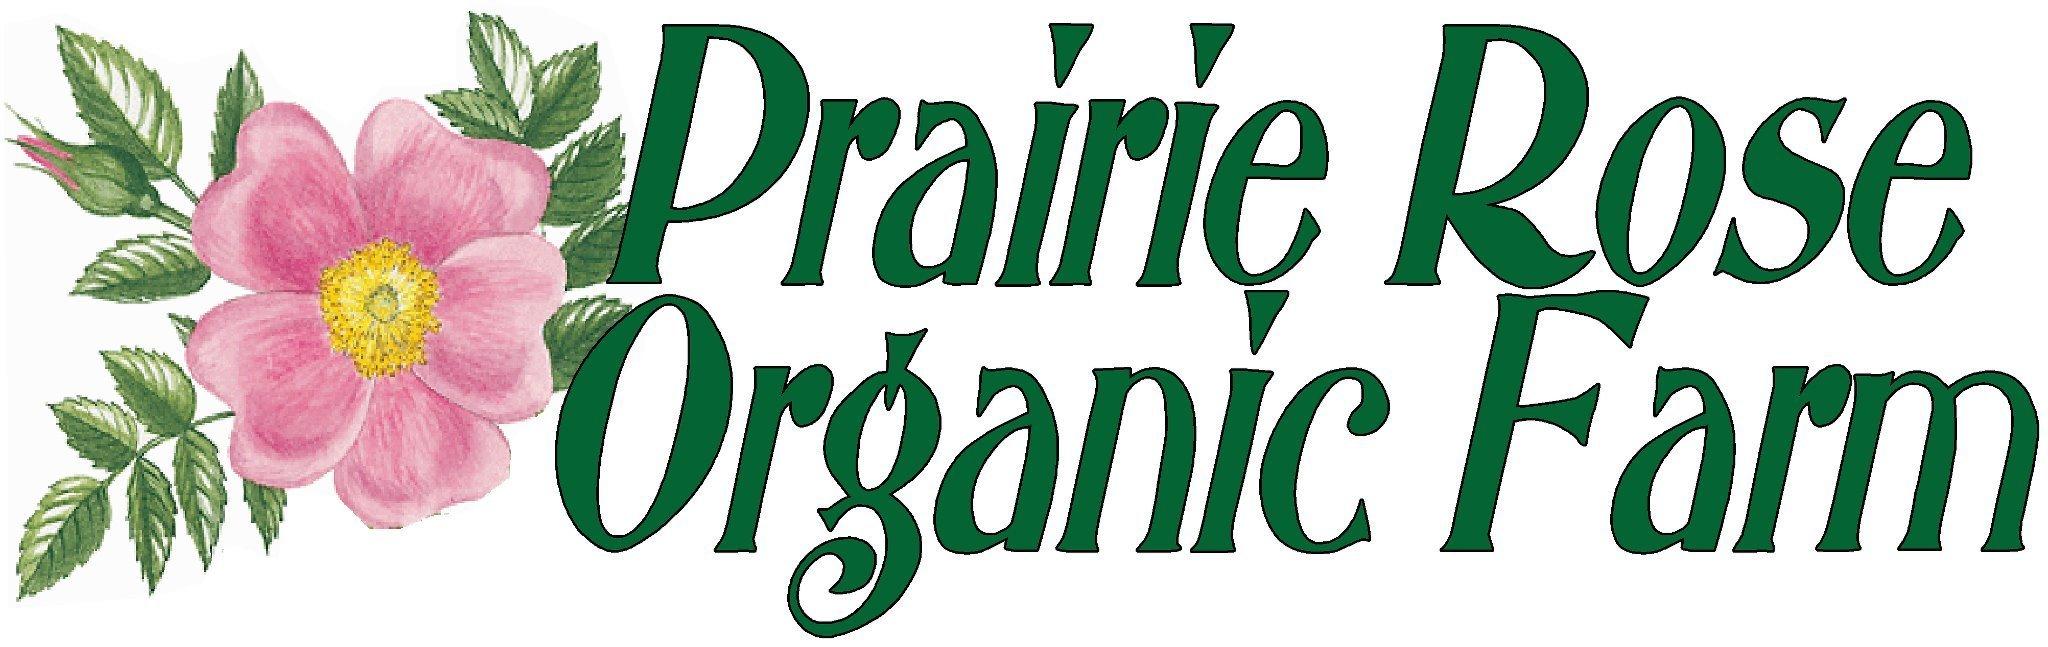 Prairie Rose Organic Pork Chops pro15